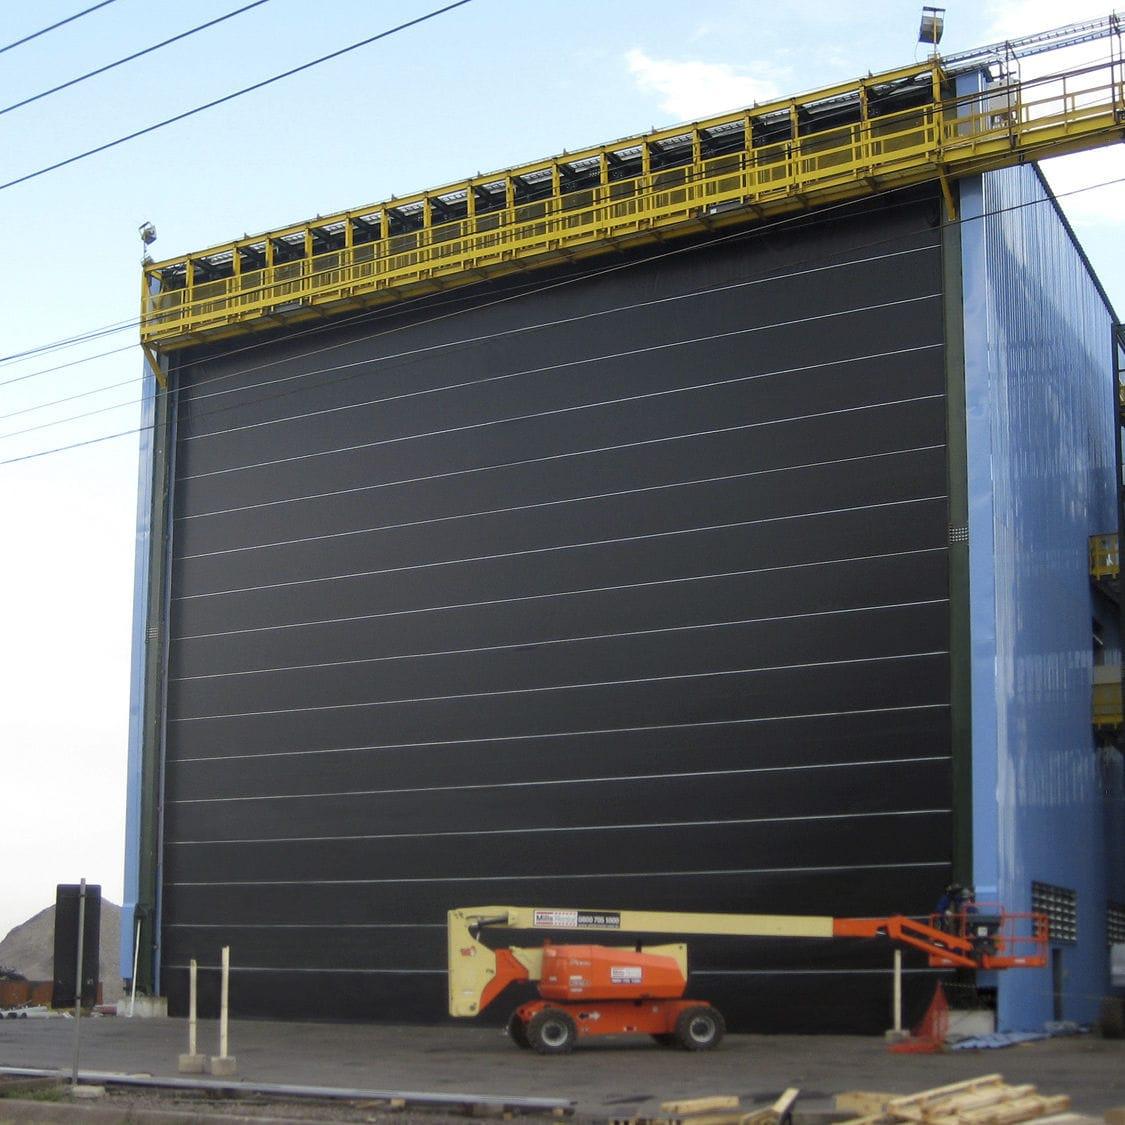 Fold-up door / industrial / hangar / shipyard & Fold-up door / industrial / hangar / shipyard - Champion Door - Videos Pezcame.Com